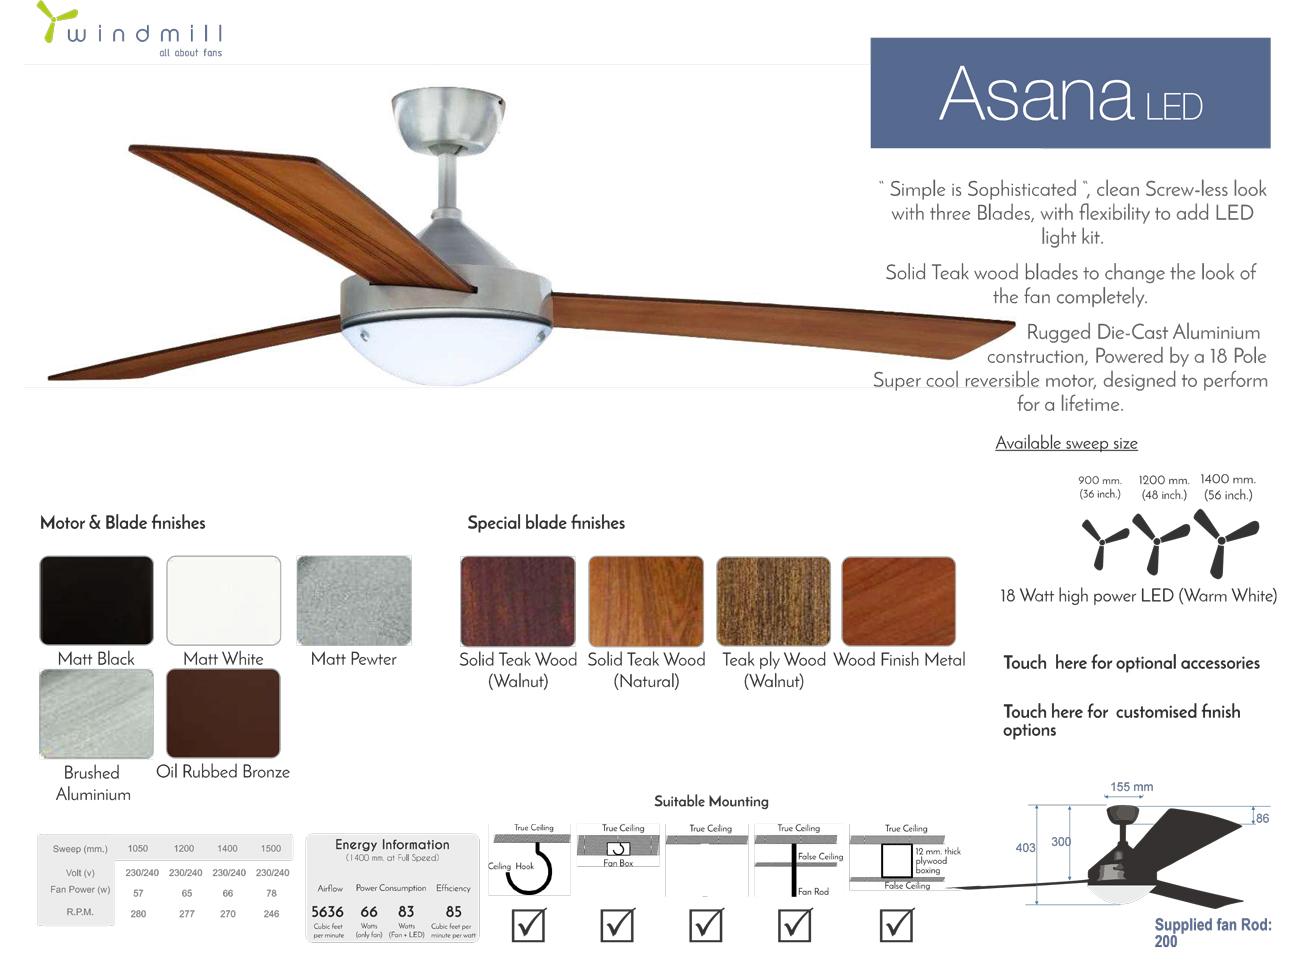 Windmill Asana